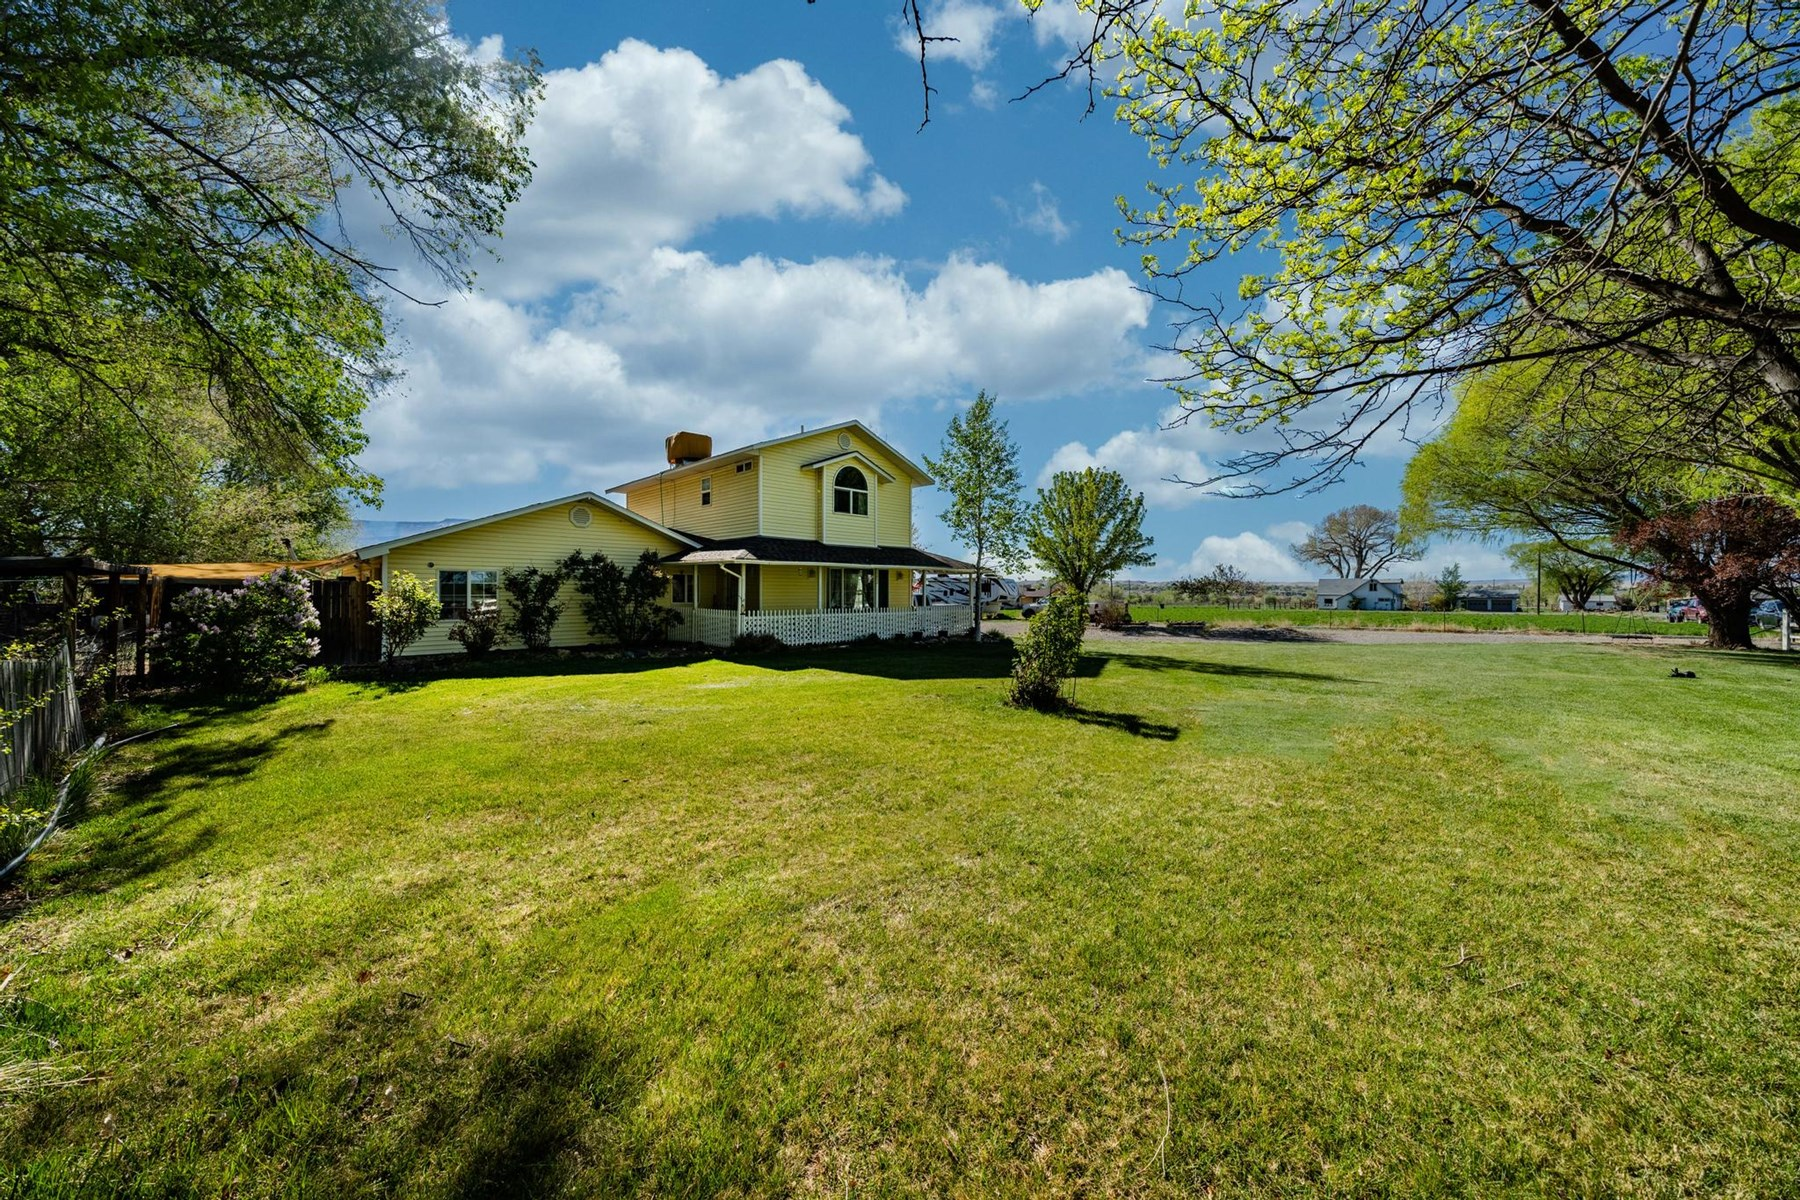 Colorado Country Home with Farmhouse Charm on Half an Acre